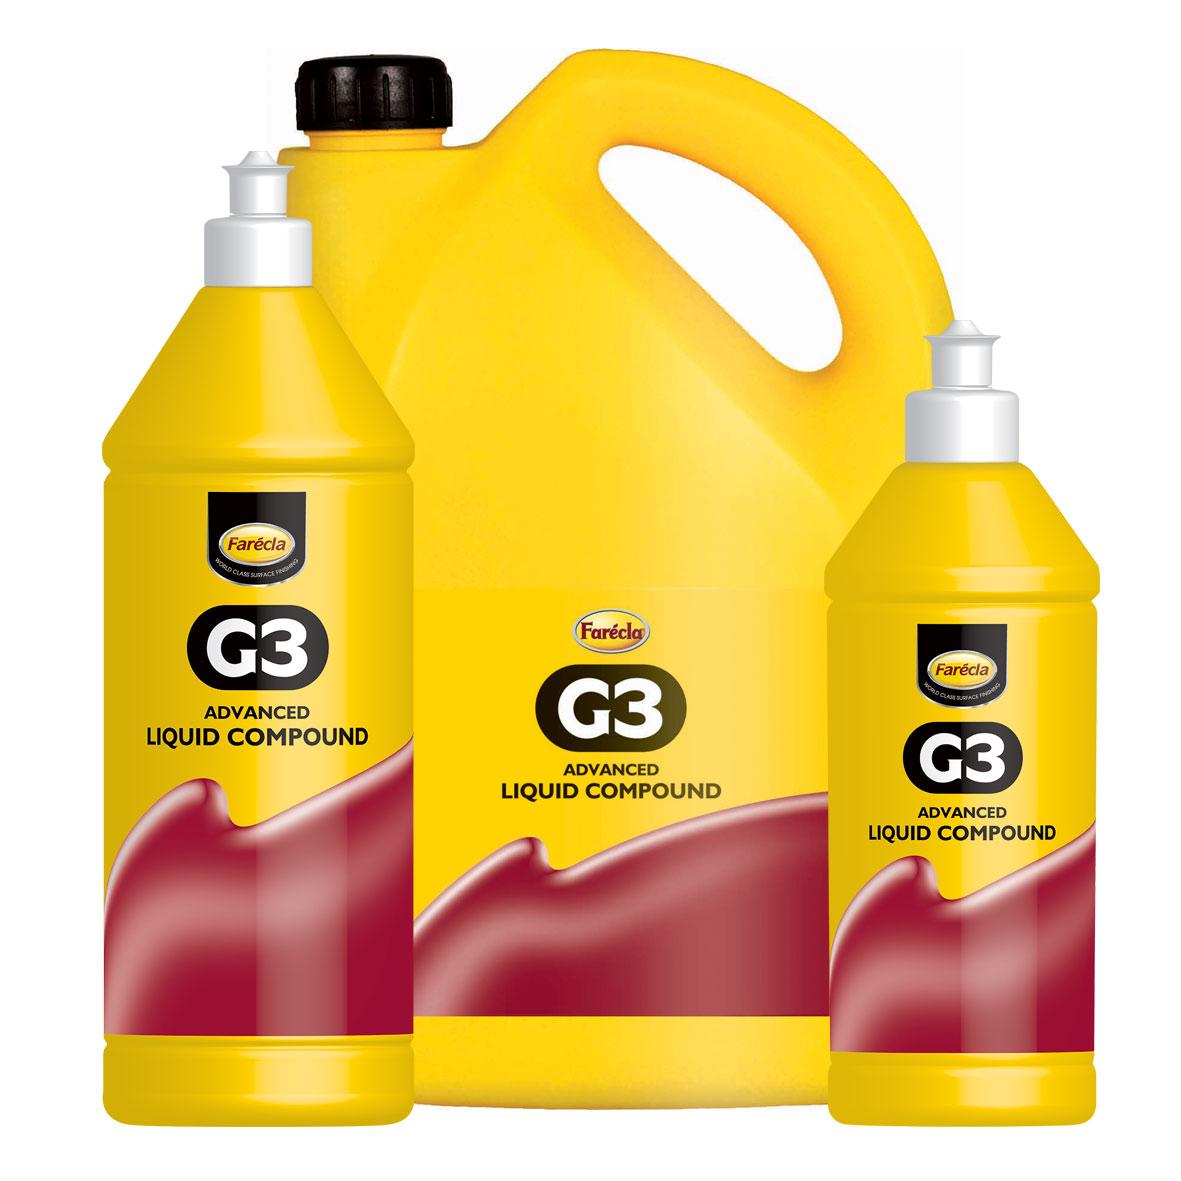 ADVANCED G3 LIQUID COMPOUND